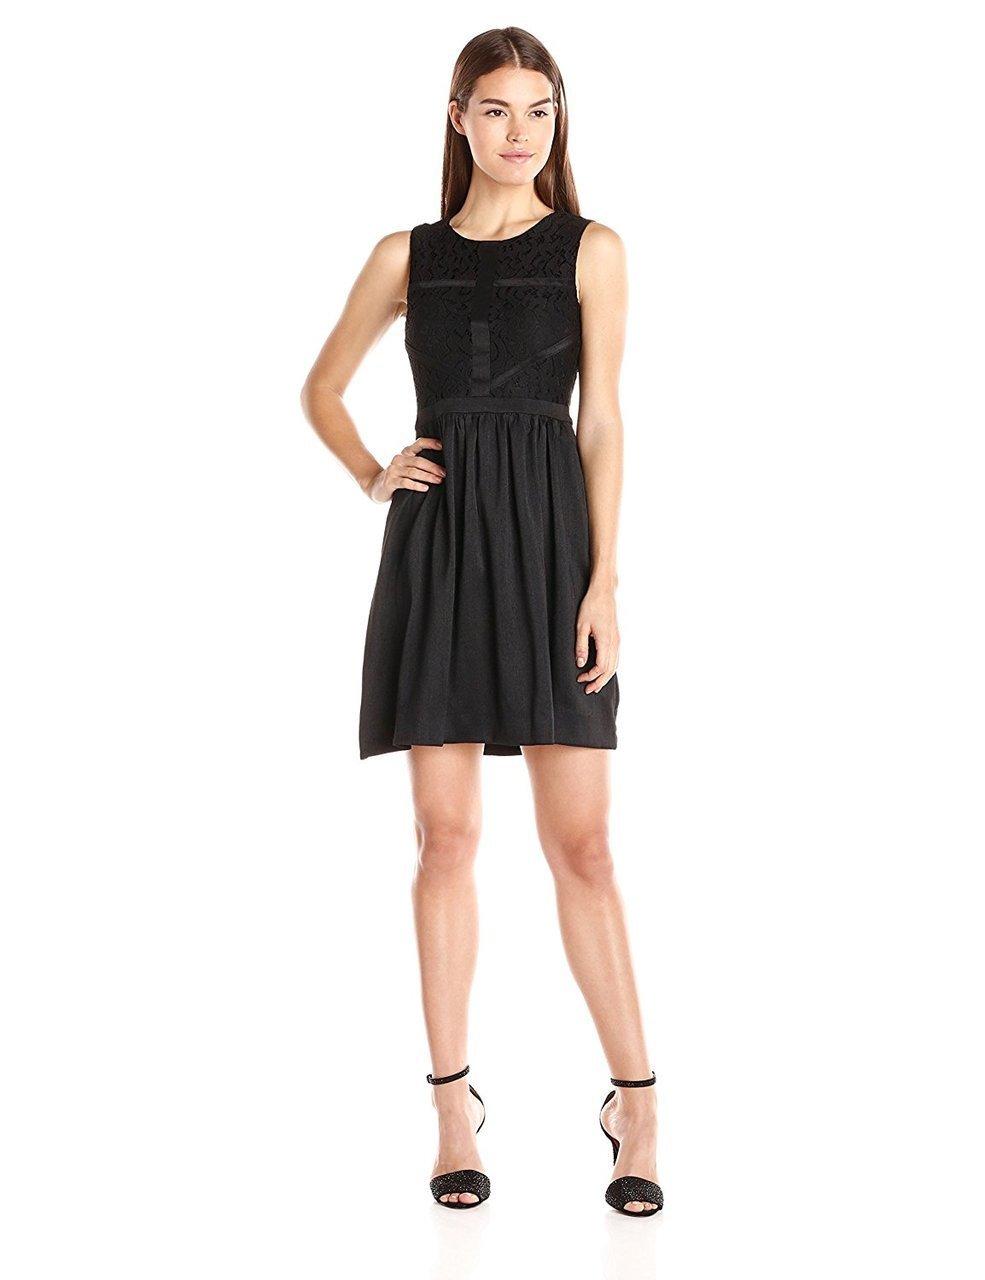 Taylor - Lace Jewel Neck Dress 5927M